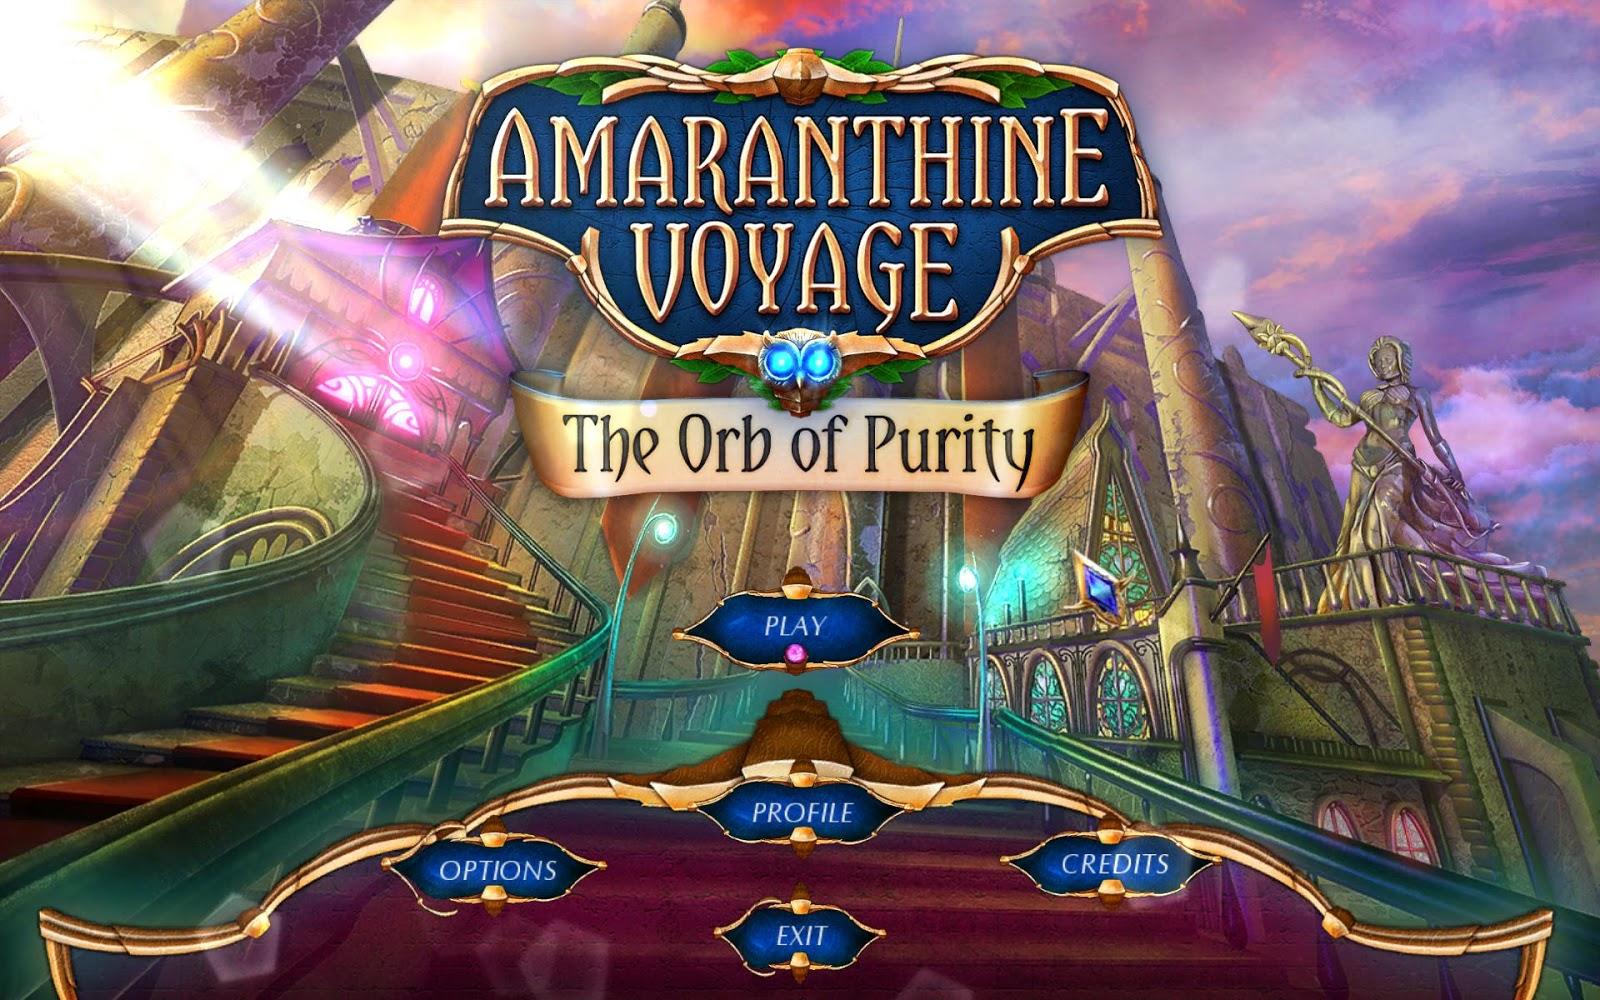 amaranthine voyage the orb of purity